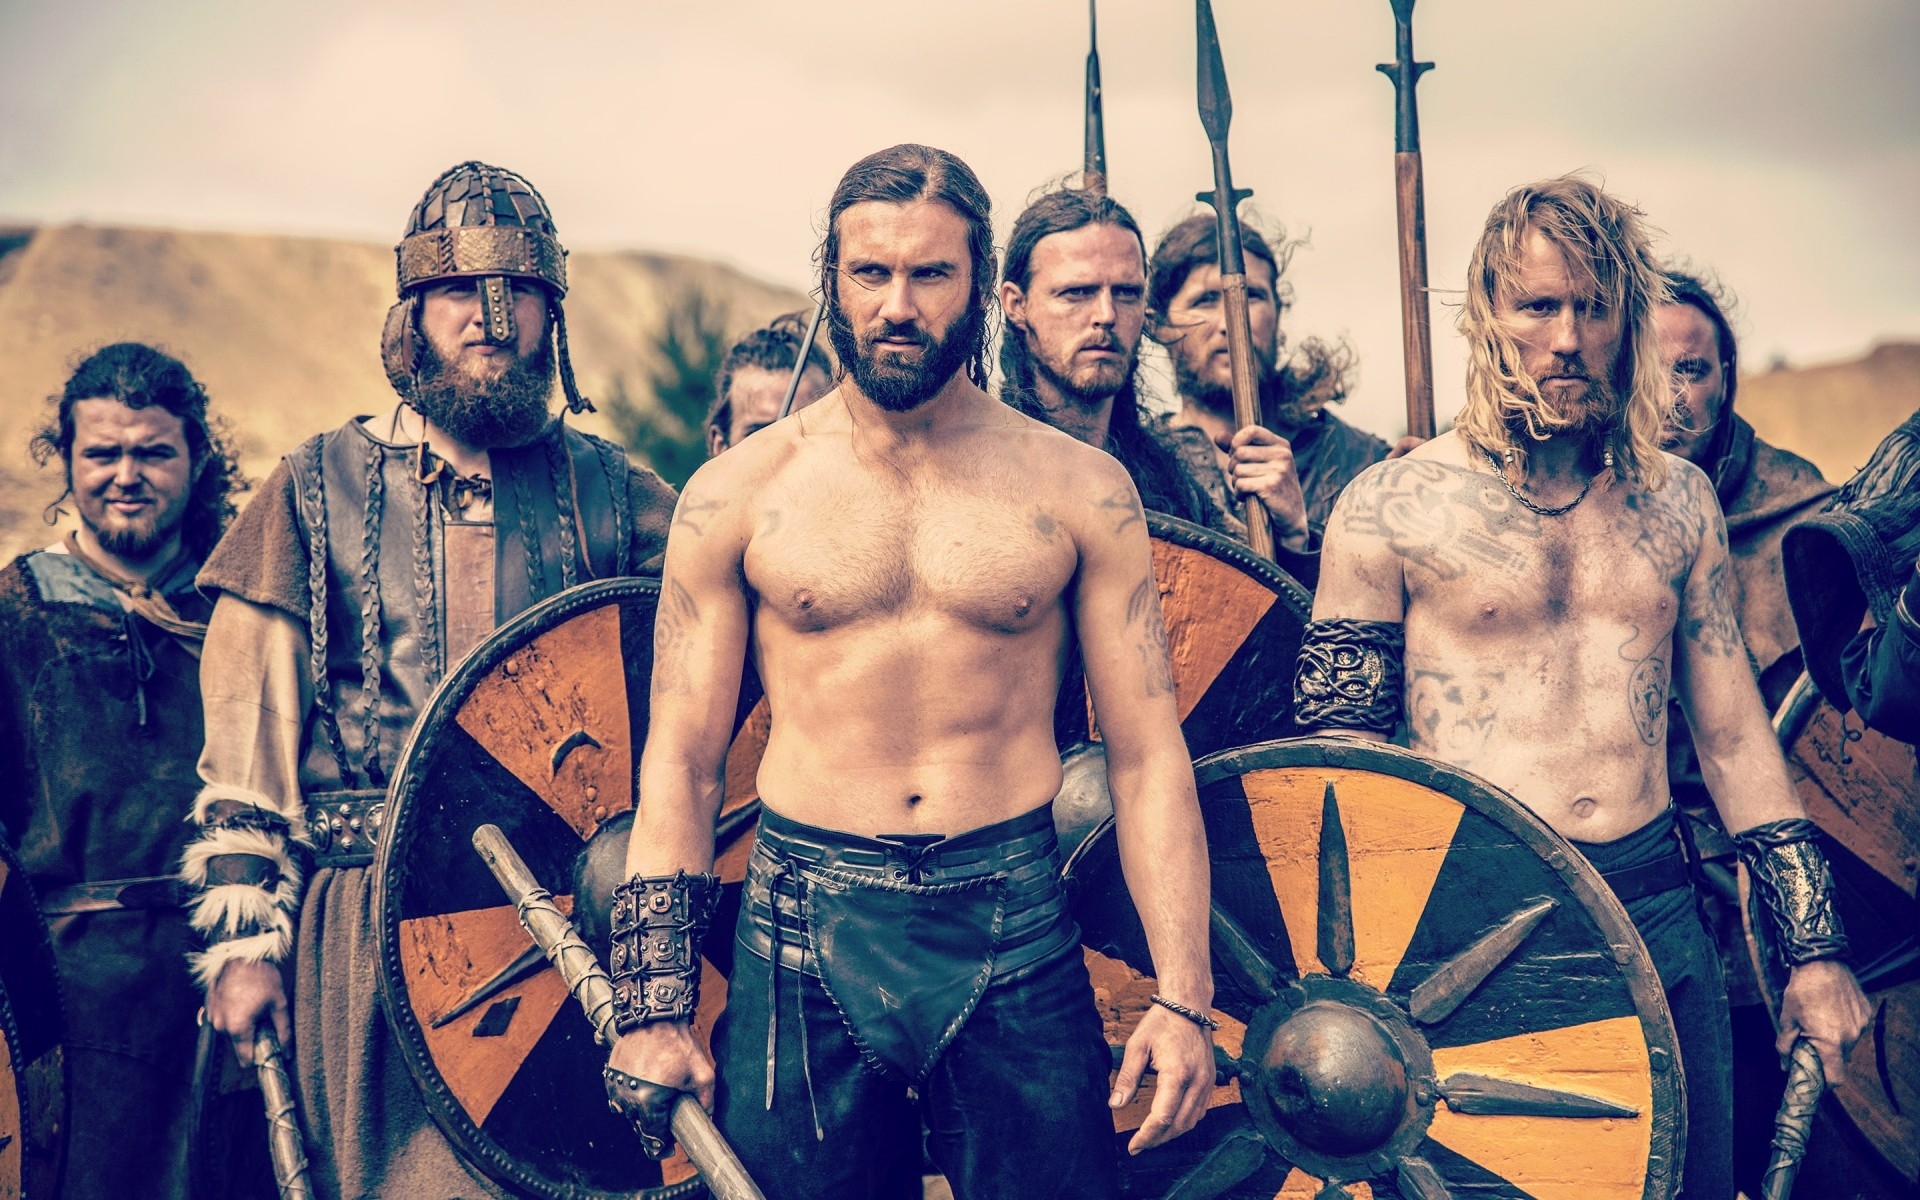 Movies Man Adult Weapon Group Sword Soldier War Military Real Vikings 1920x1200 Wallpaper Teahub Io